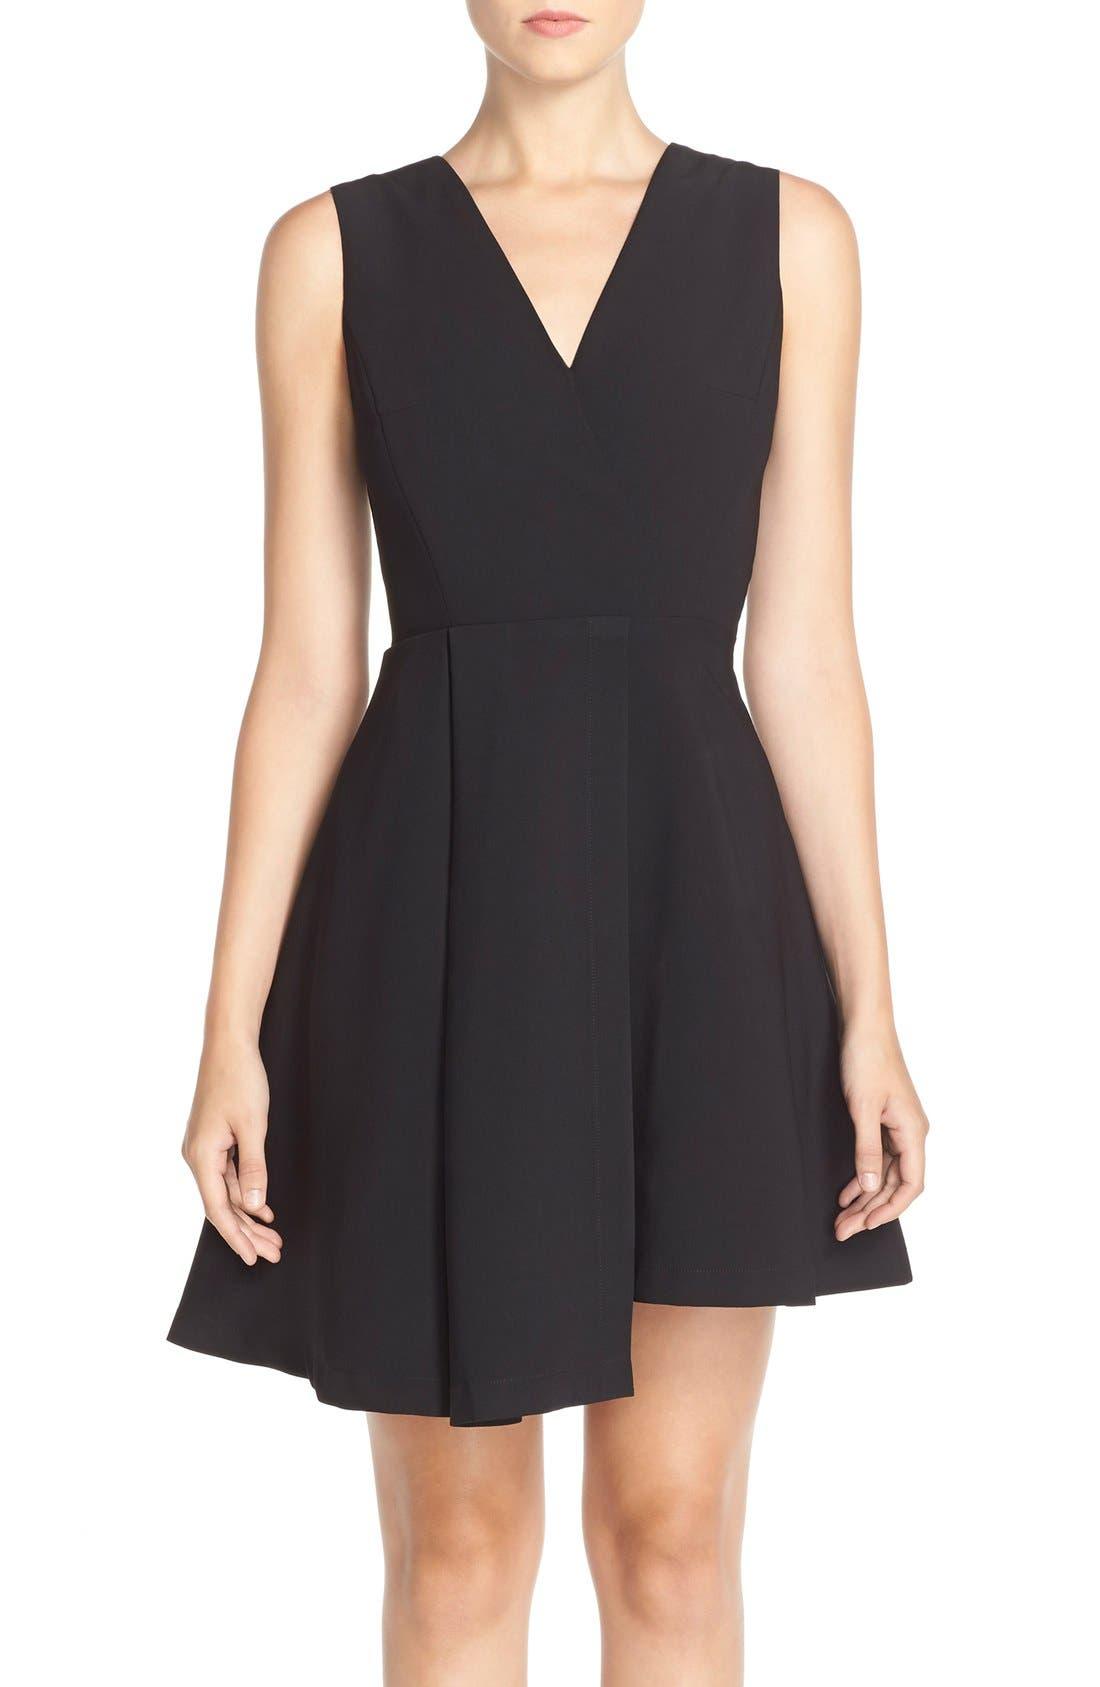 Alternate Image 1 Selected - Adelyn Rae Asymmetrical Fit & Flare Dress